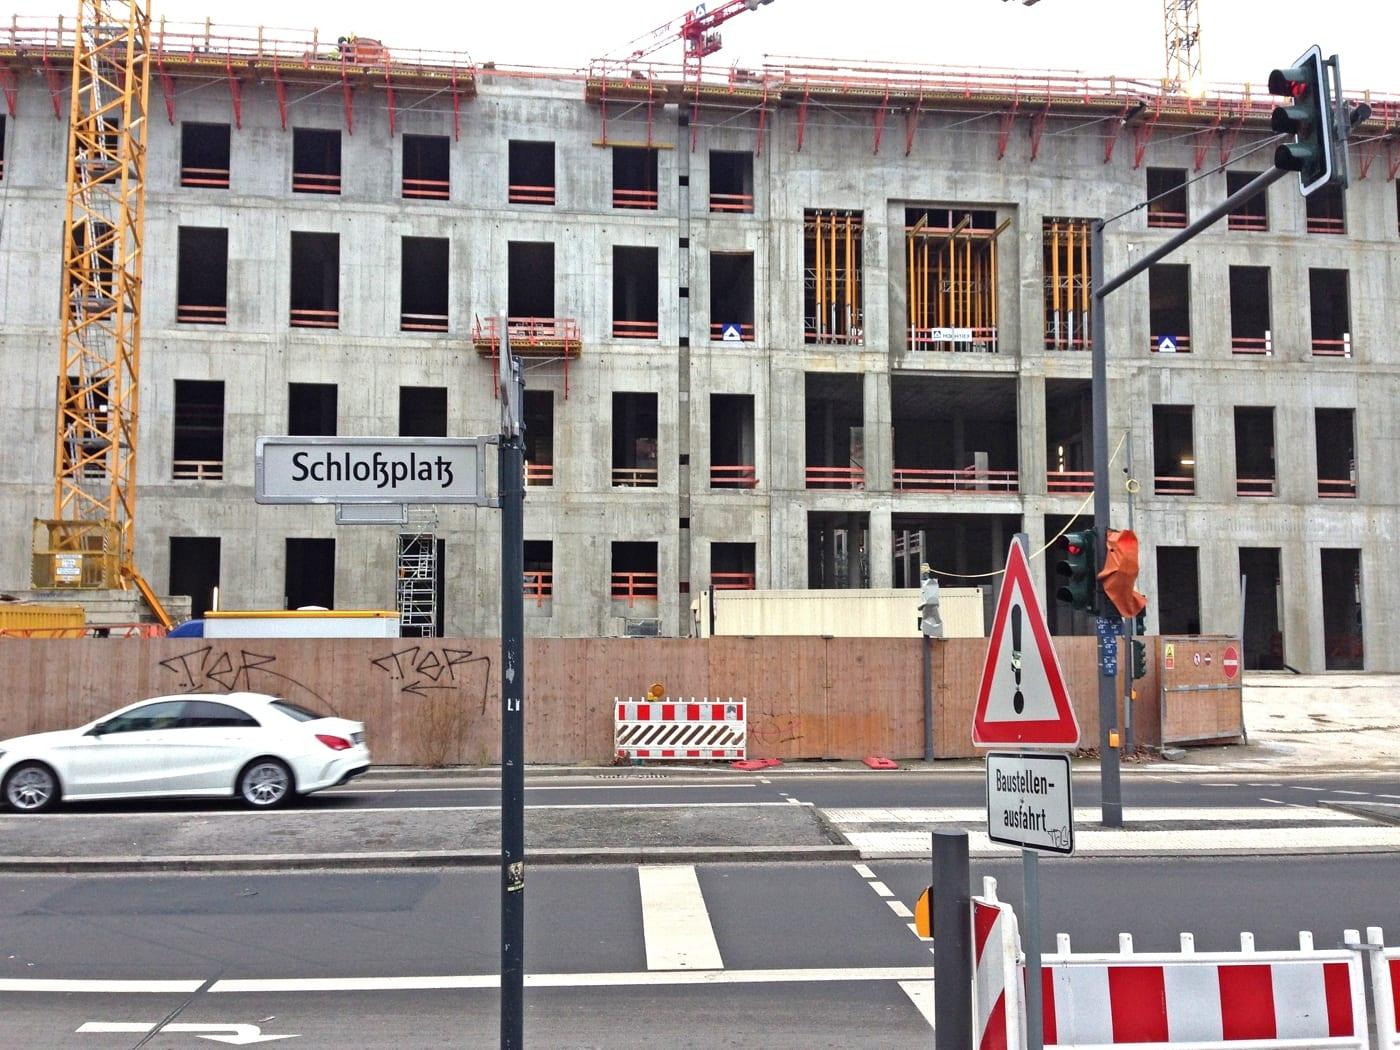 rohbau-stadtschloss-berlin-baustelle-januar-2015-foto-eric-sturm-IMG_1088.jpg